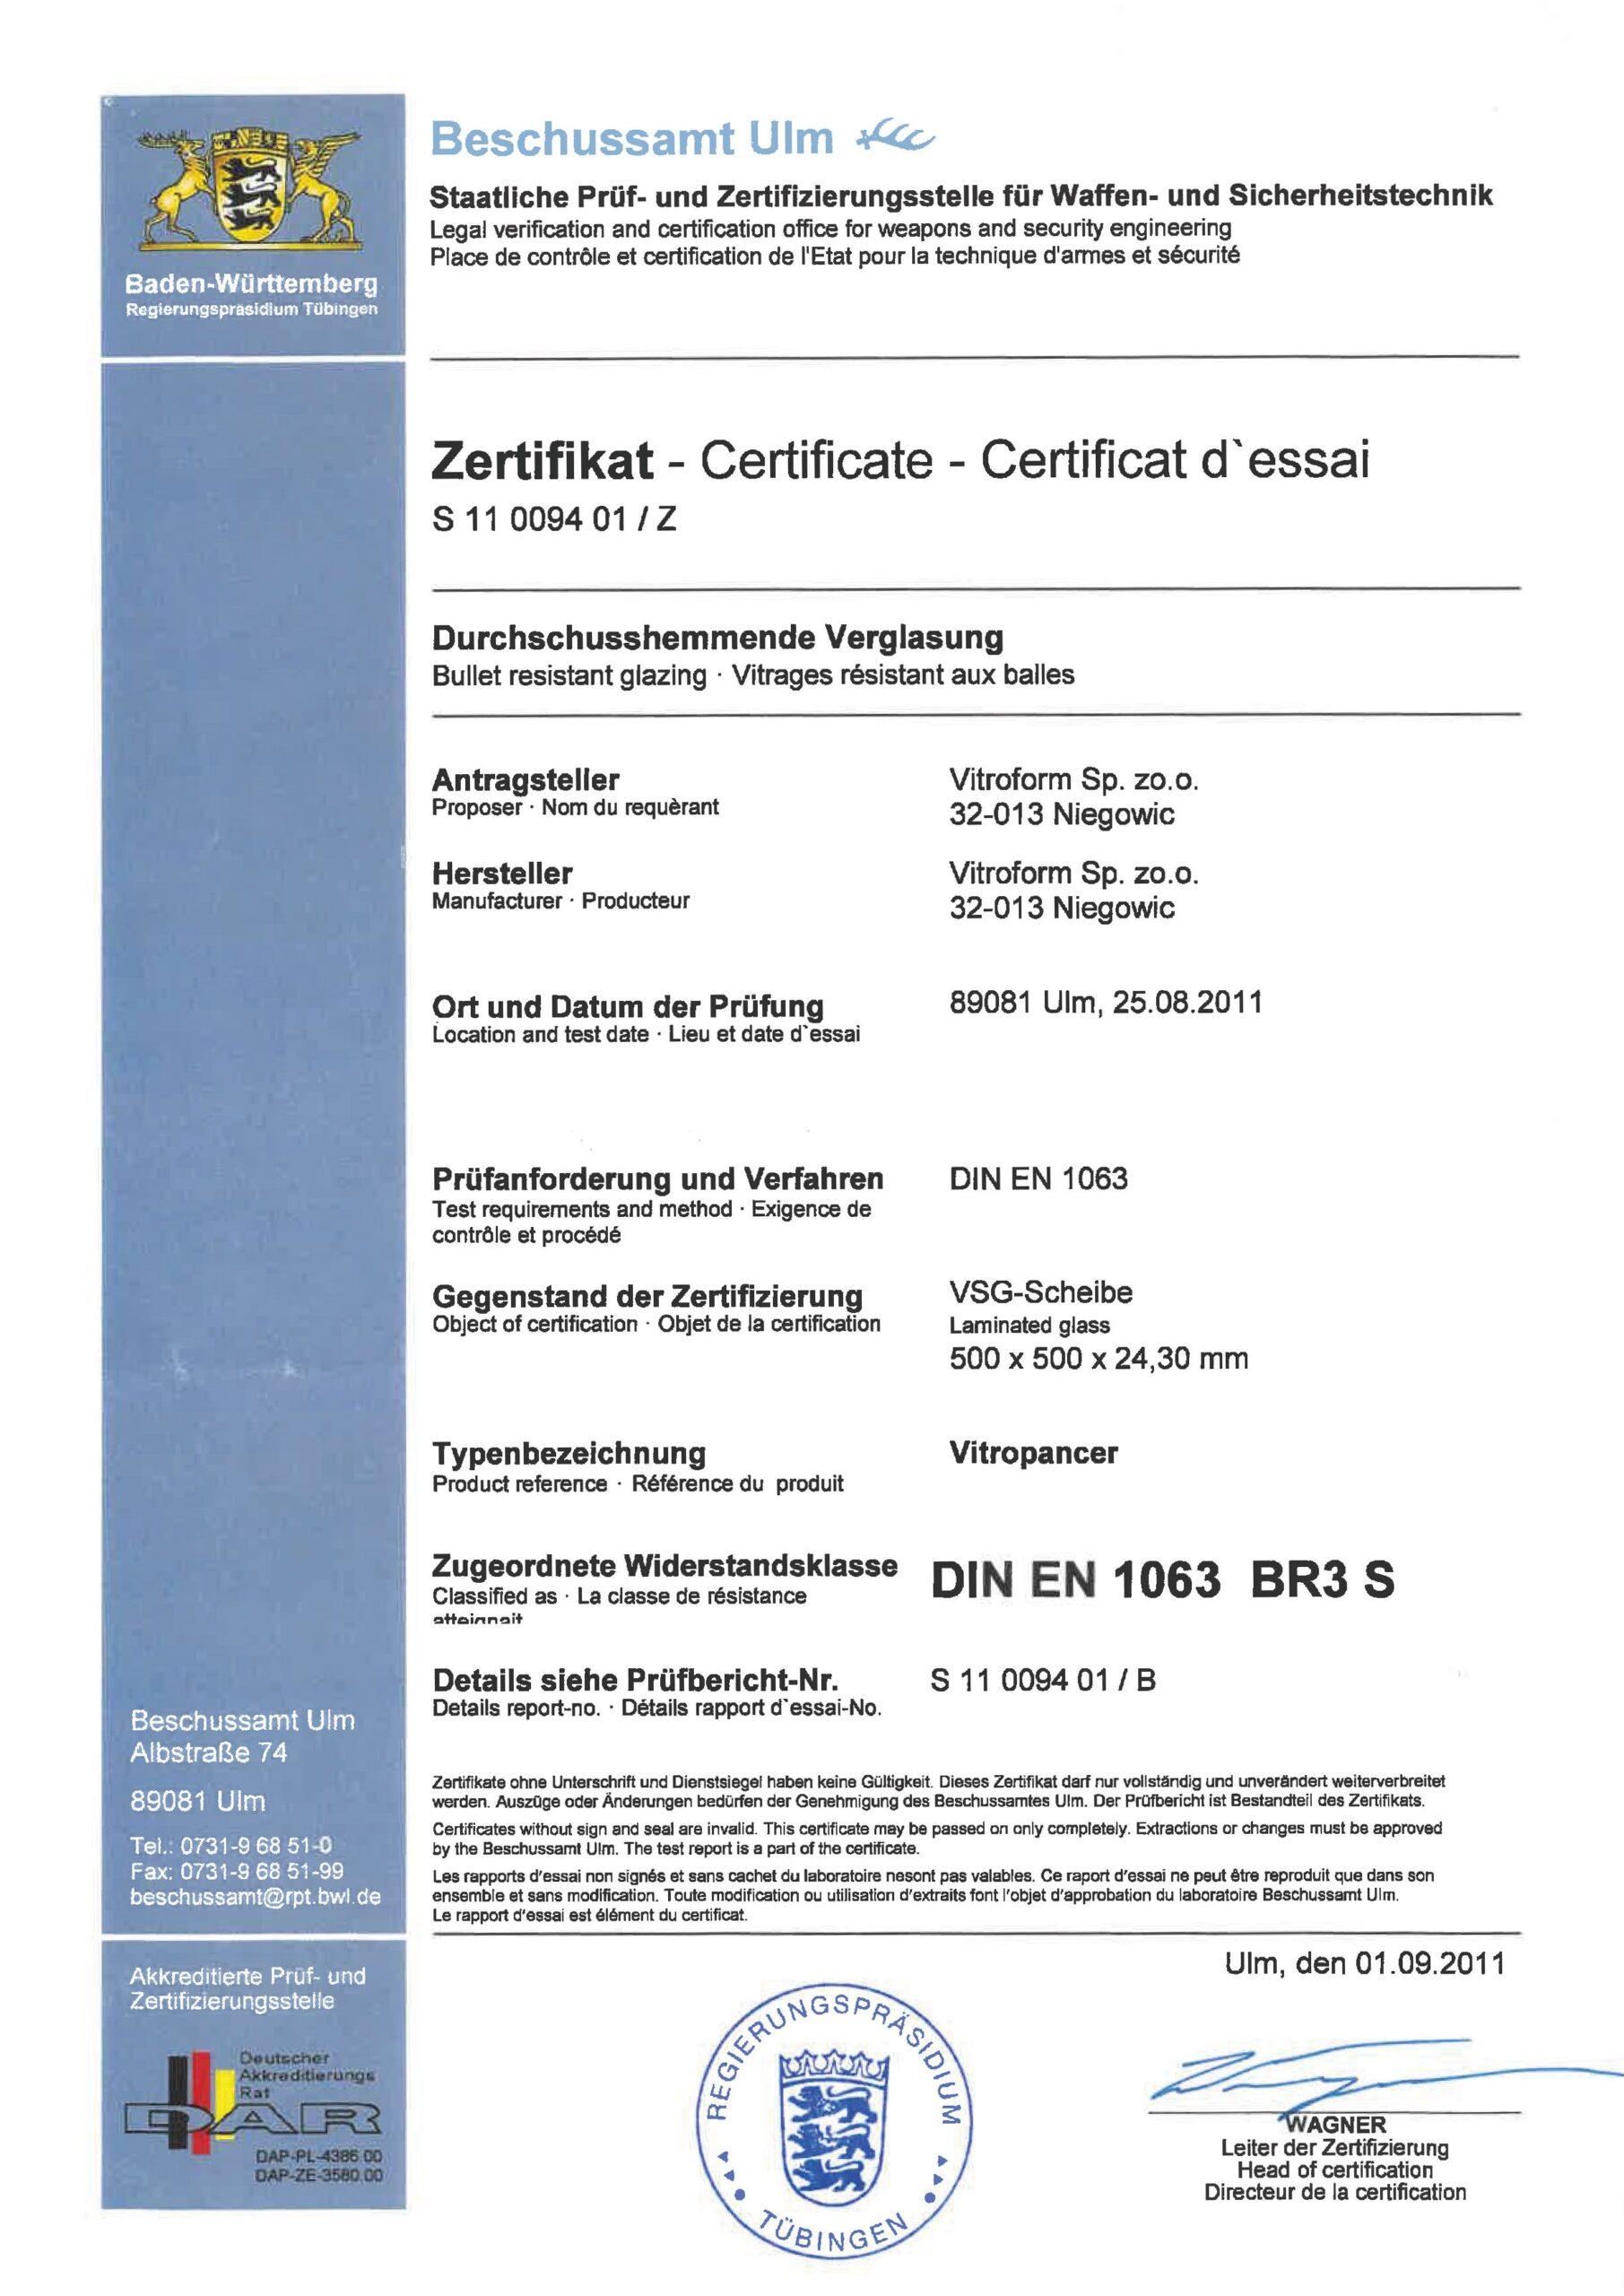 Certyfikat-BR3-S-Kuloodporne-po-aktualizacji-scaled.jpg